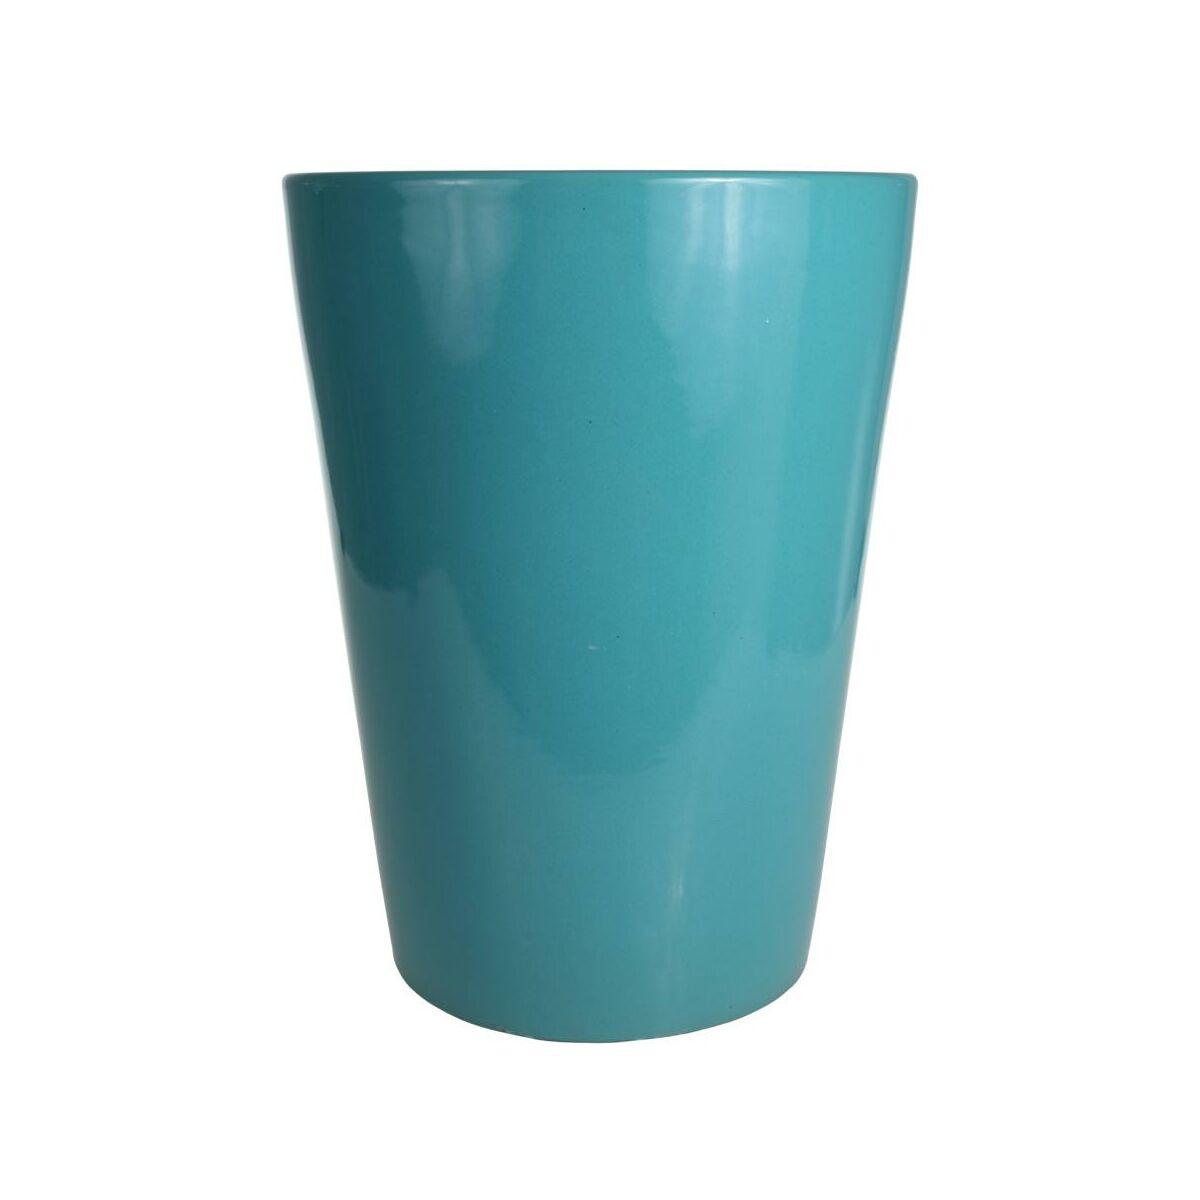 Donica Ceramiczna 42 Cm Turkusowa